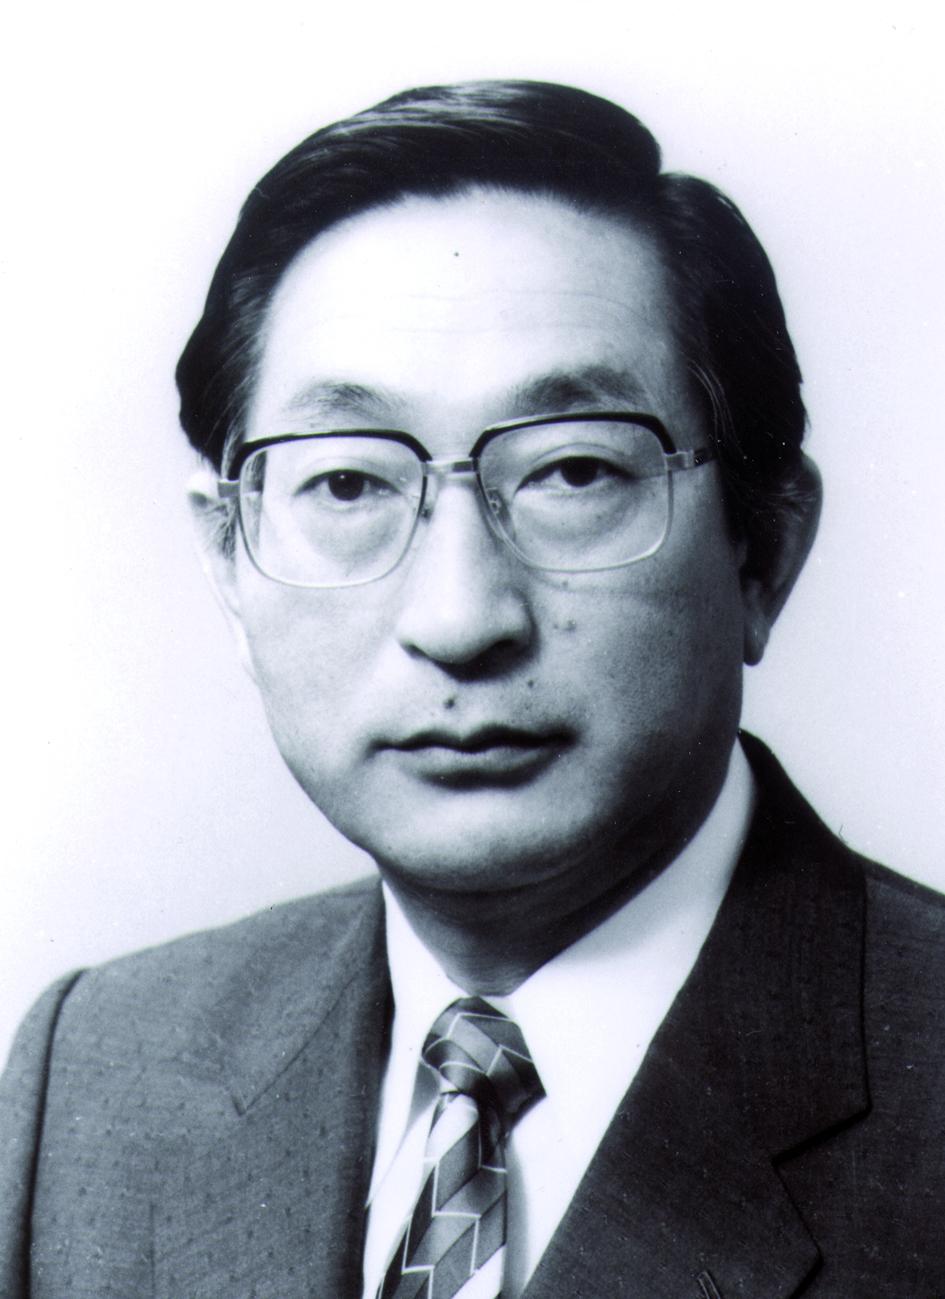 Portraitfoto von Herrn Mitsuyaki Abe.